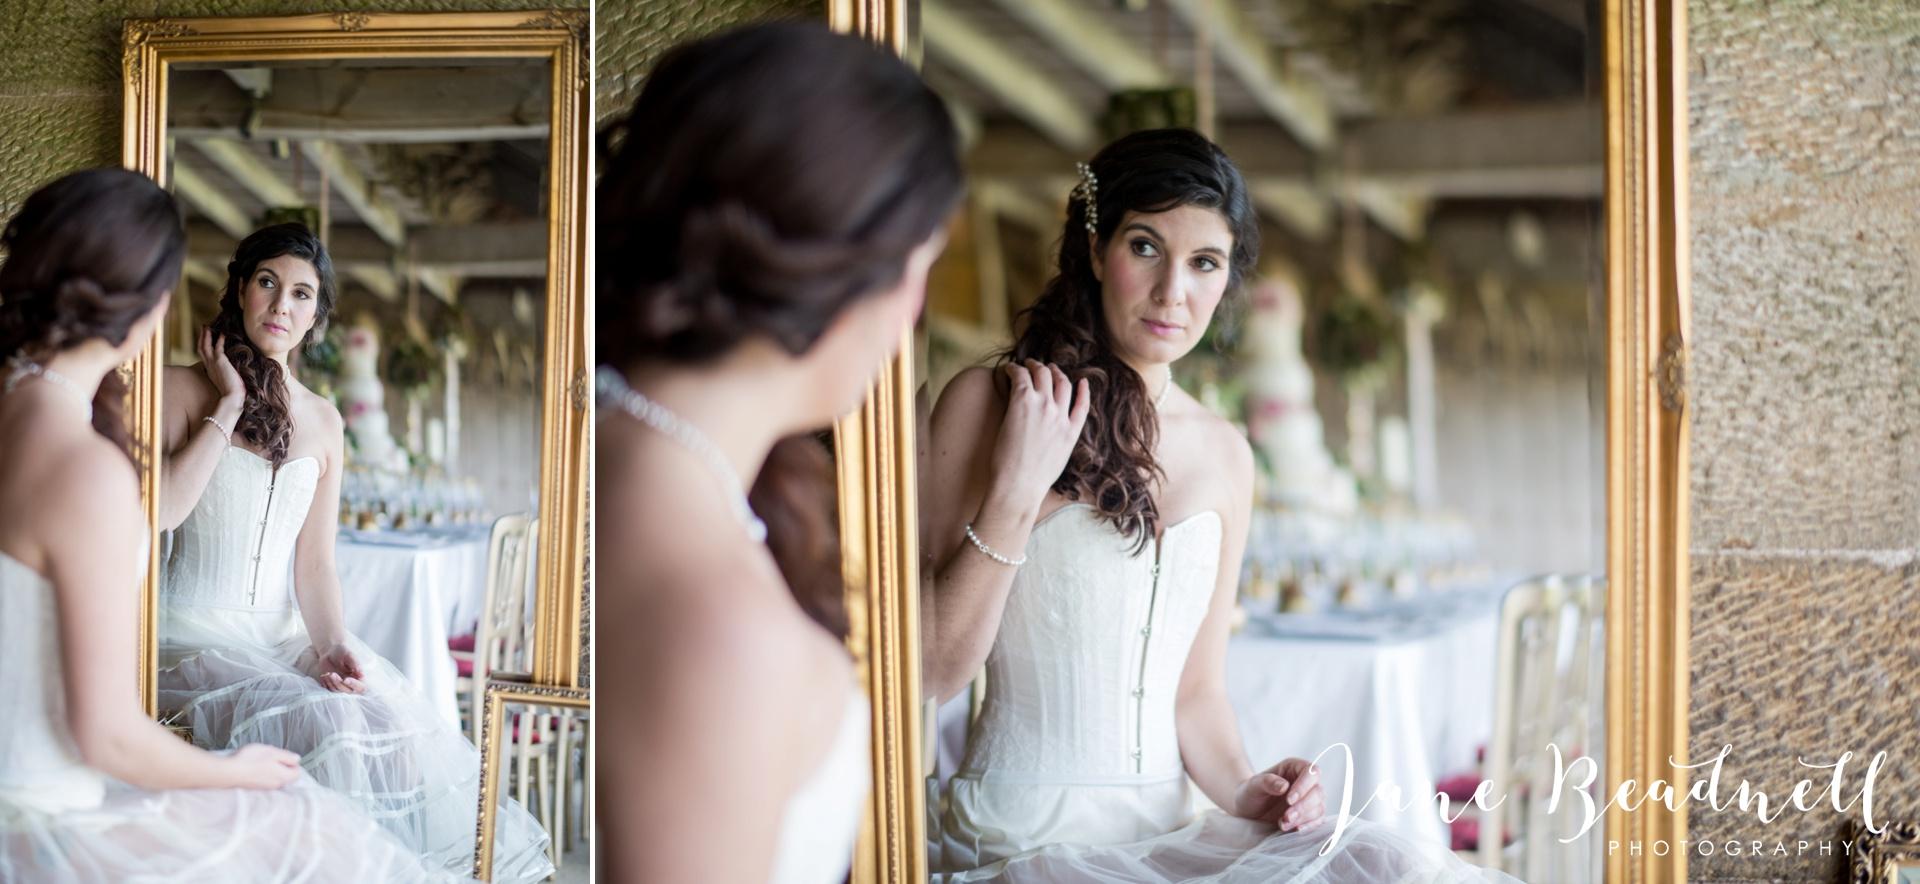 Jane Beadnell fine art wedding photographer Swinton Park12